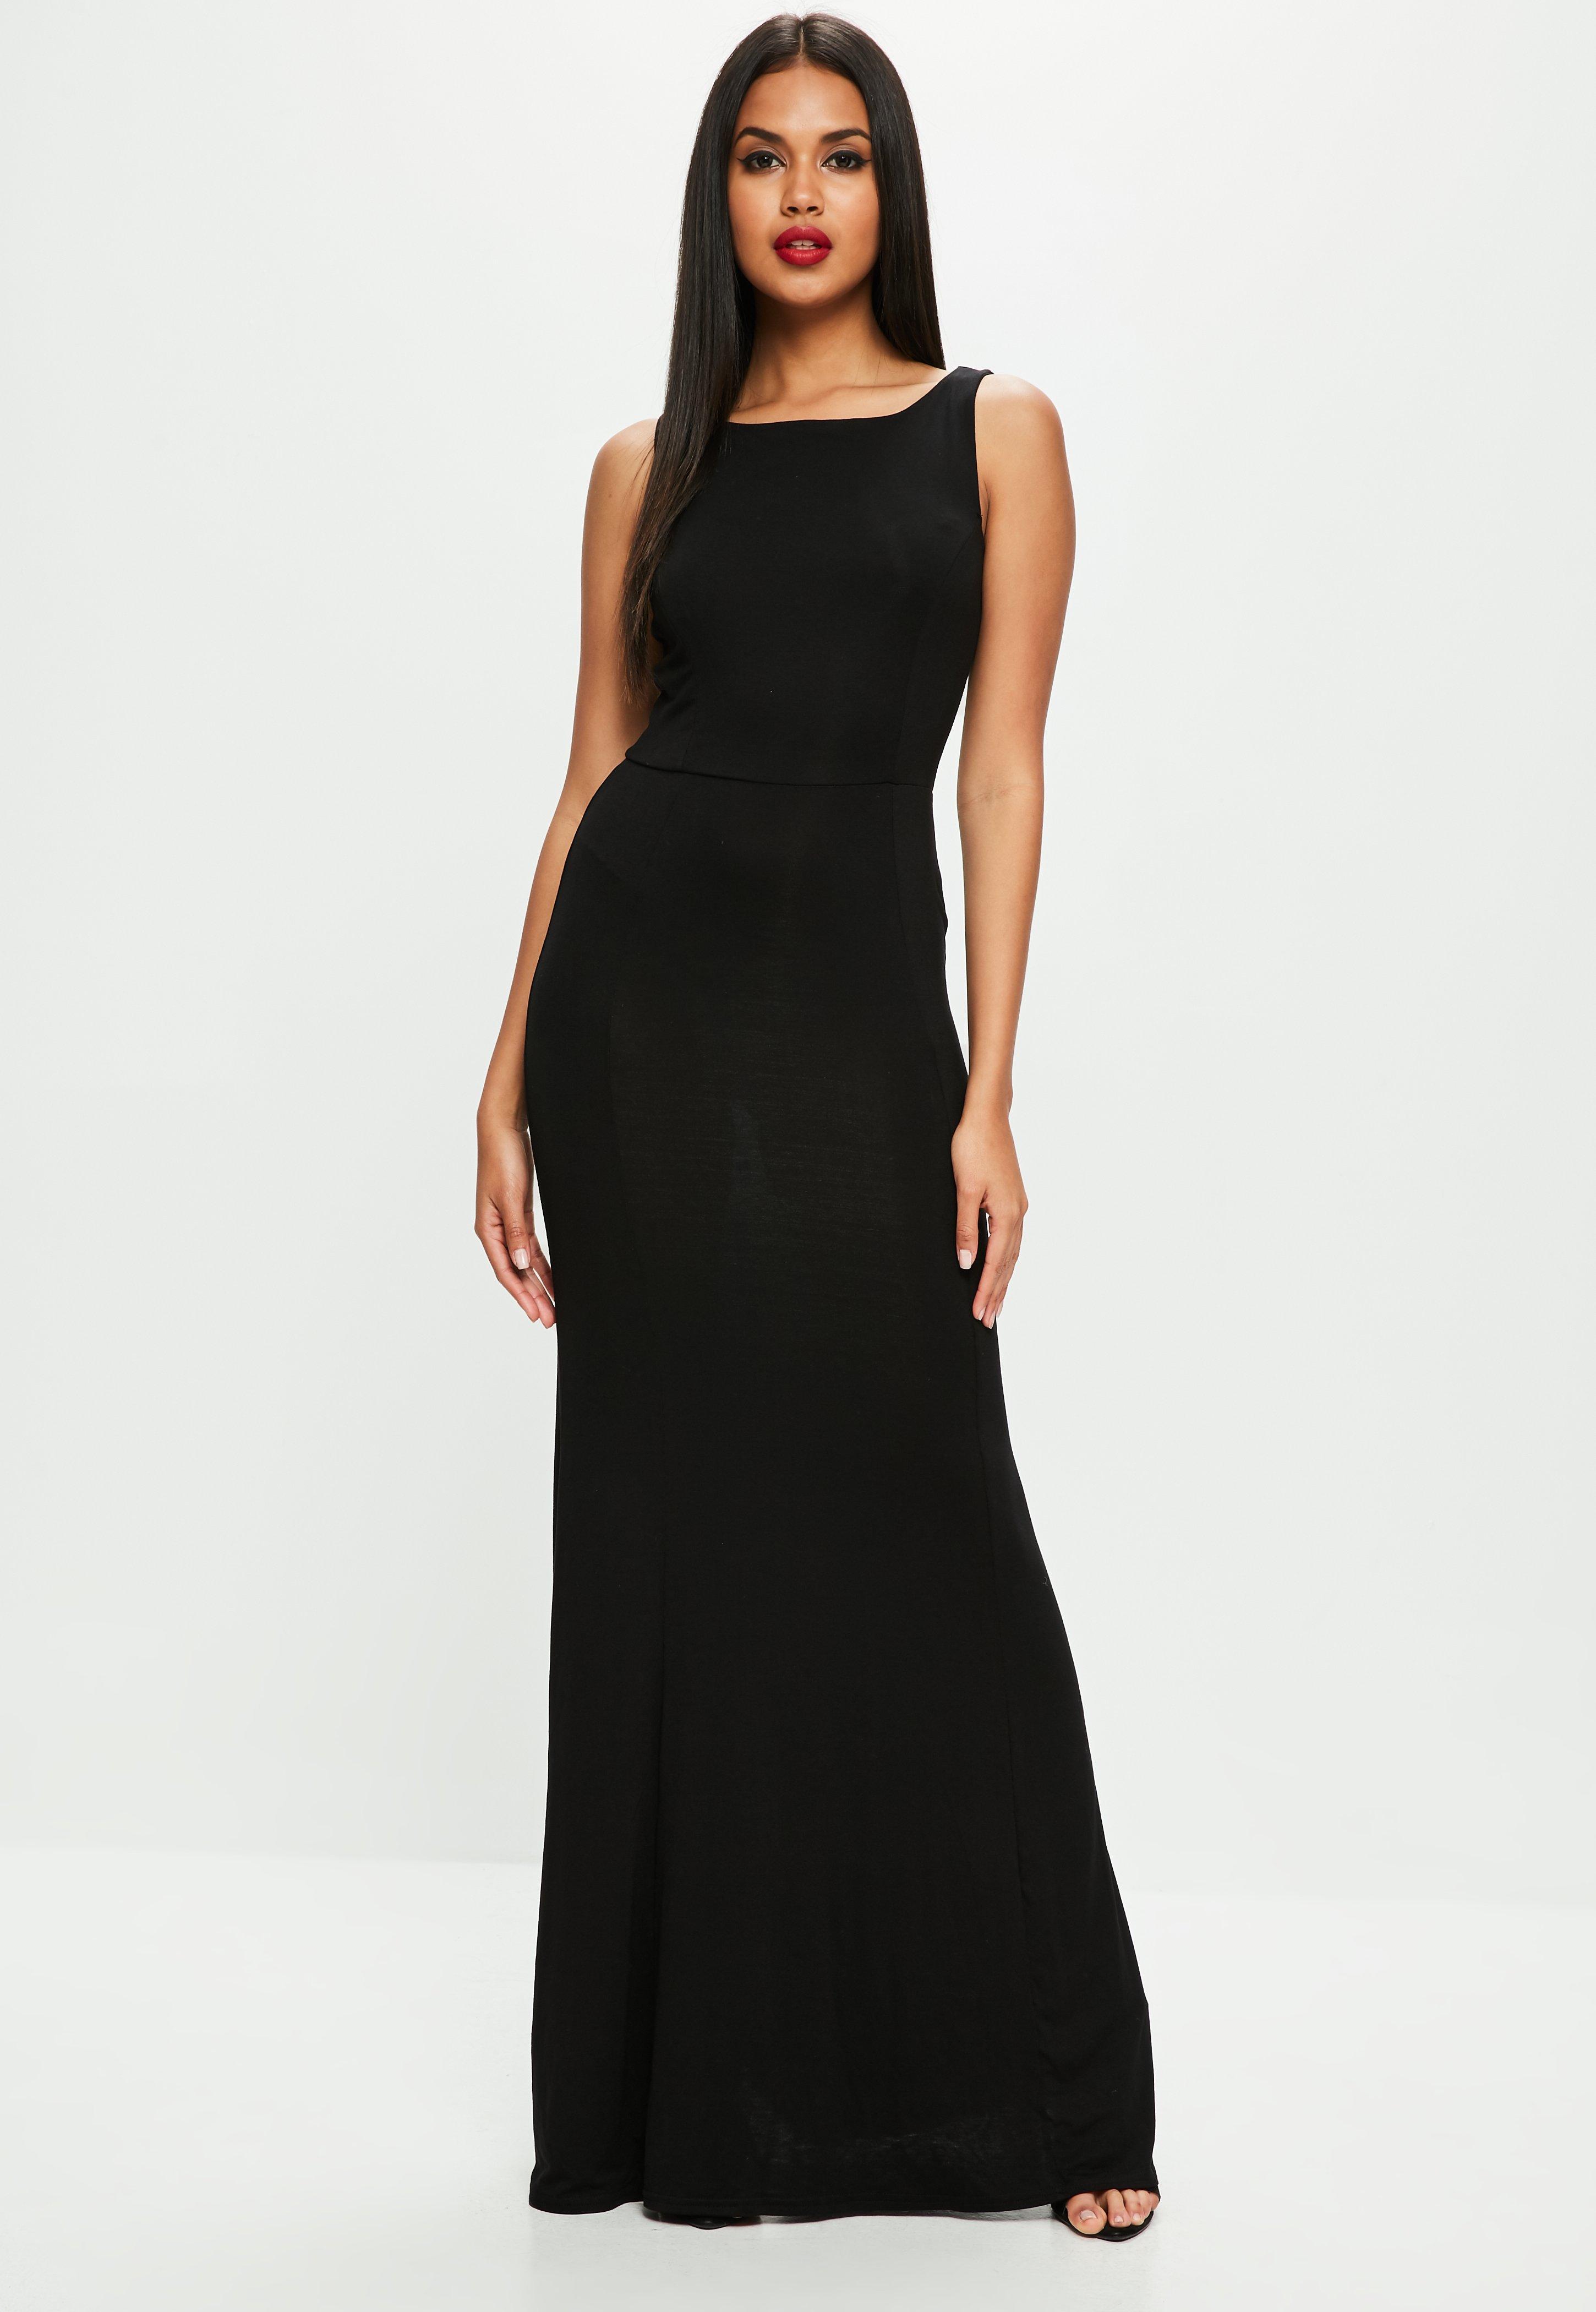 Black Sleeveless Scoop Back Maxi Dress | Missguided